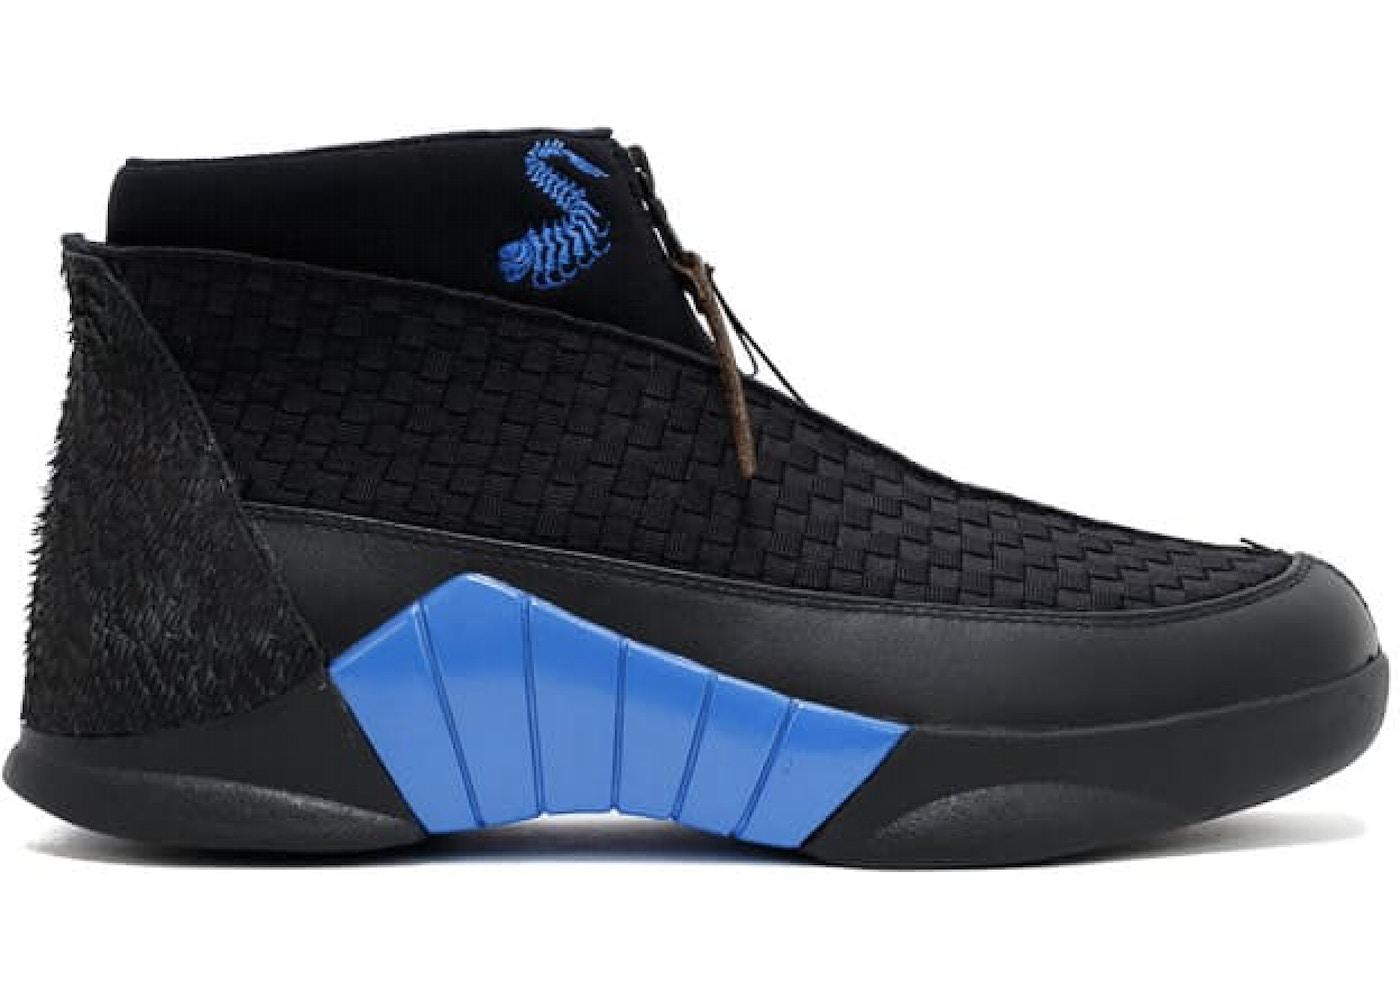 e92e21a3feb Buy Air Jordan 15 Shoes & Deadstock Sneakers